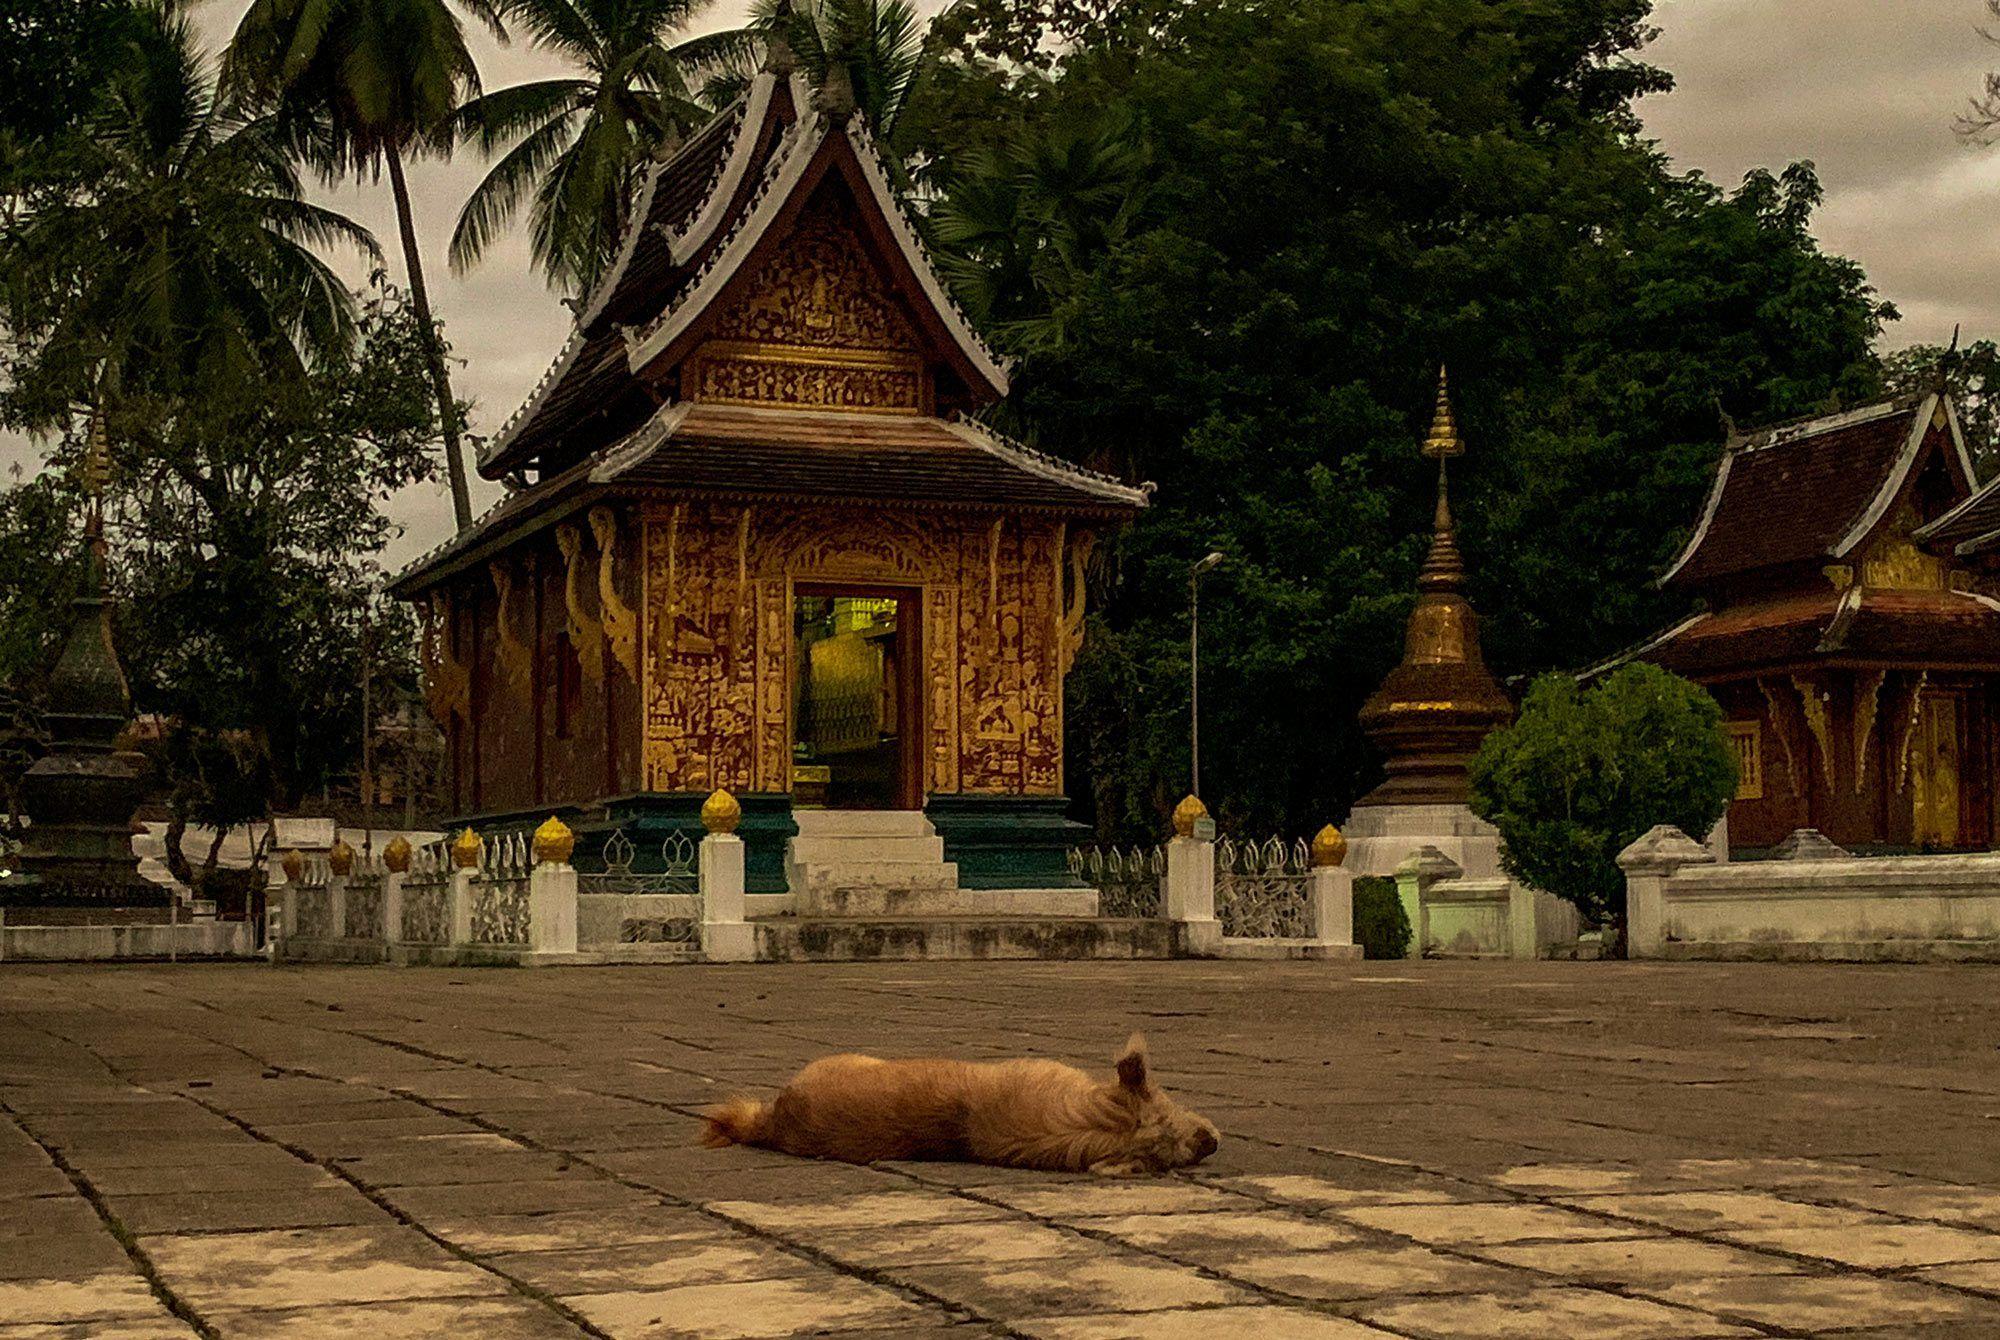 schlafender Hund in Luang Prabang